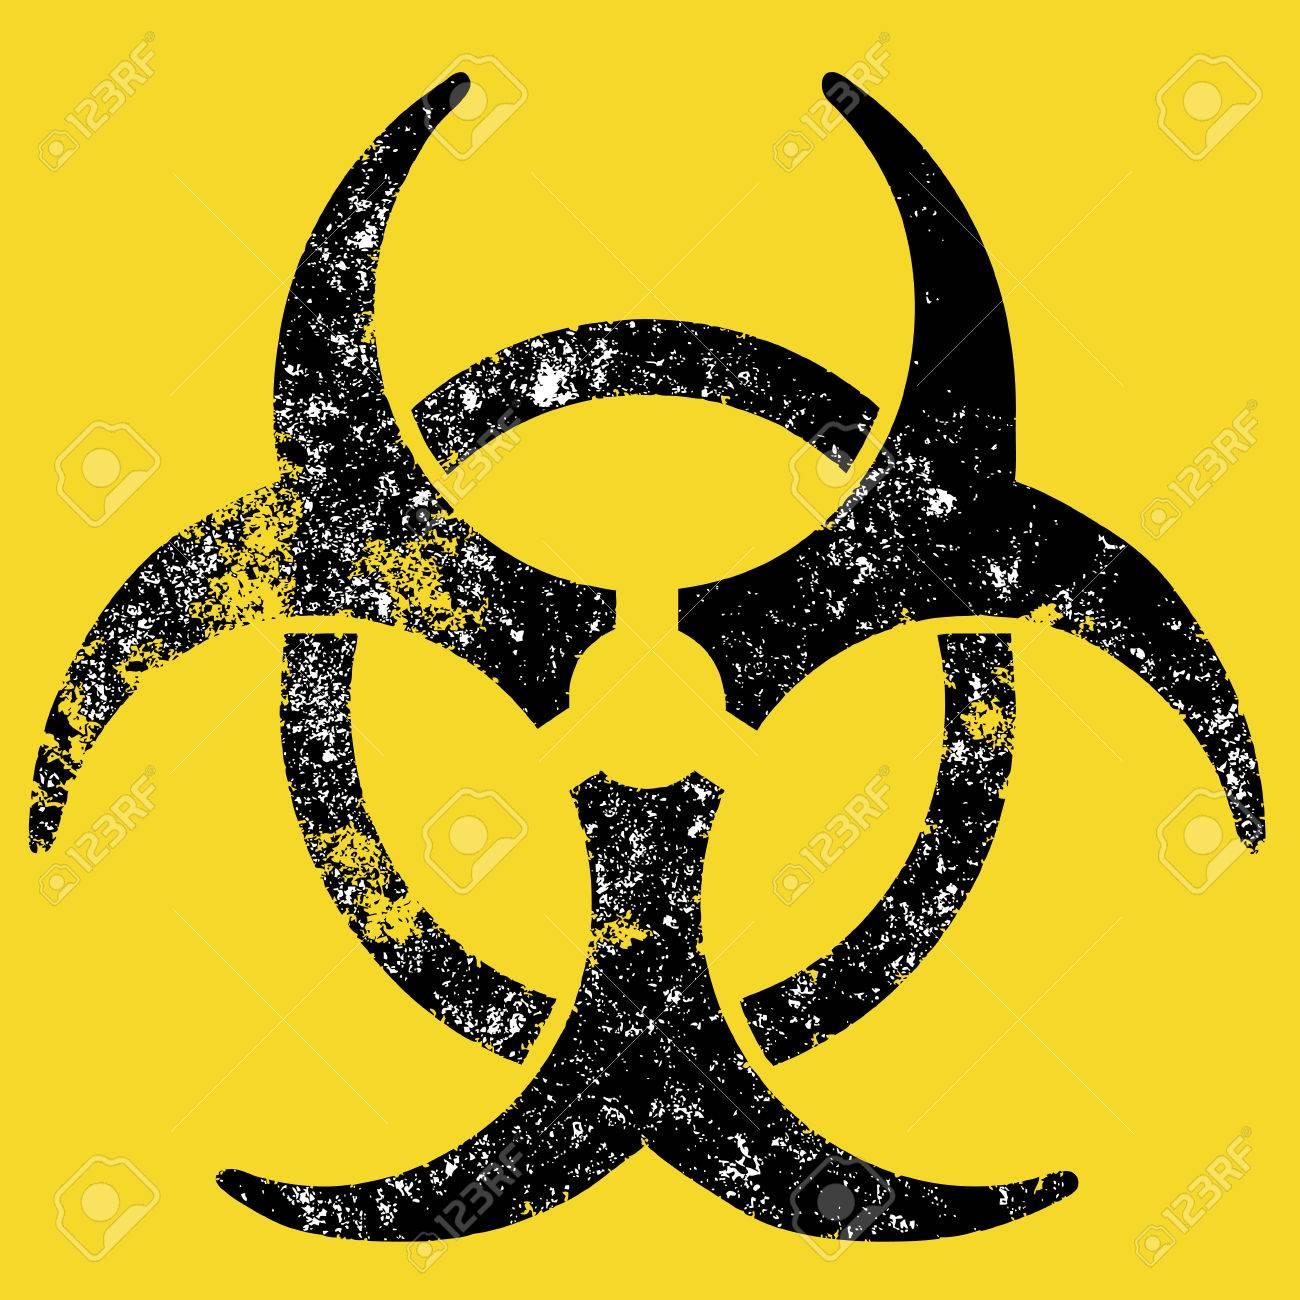 Grunge Biohazard sign Stock Vector - 7100300